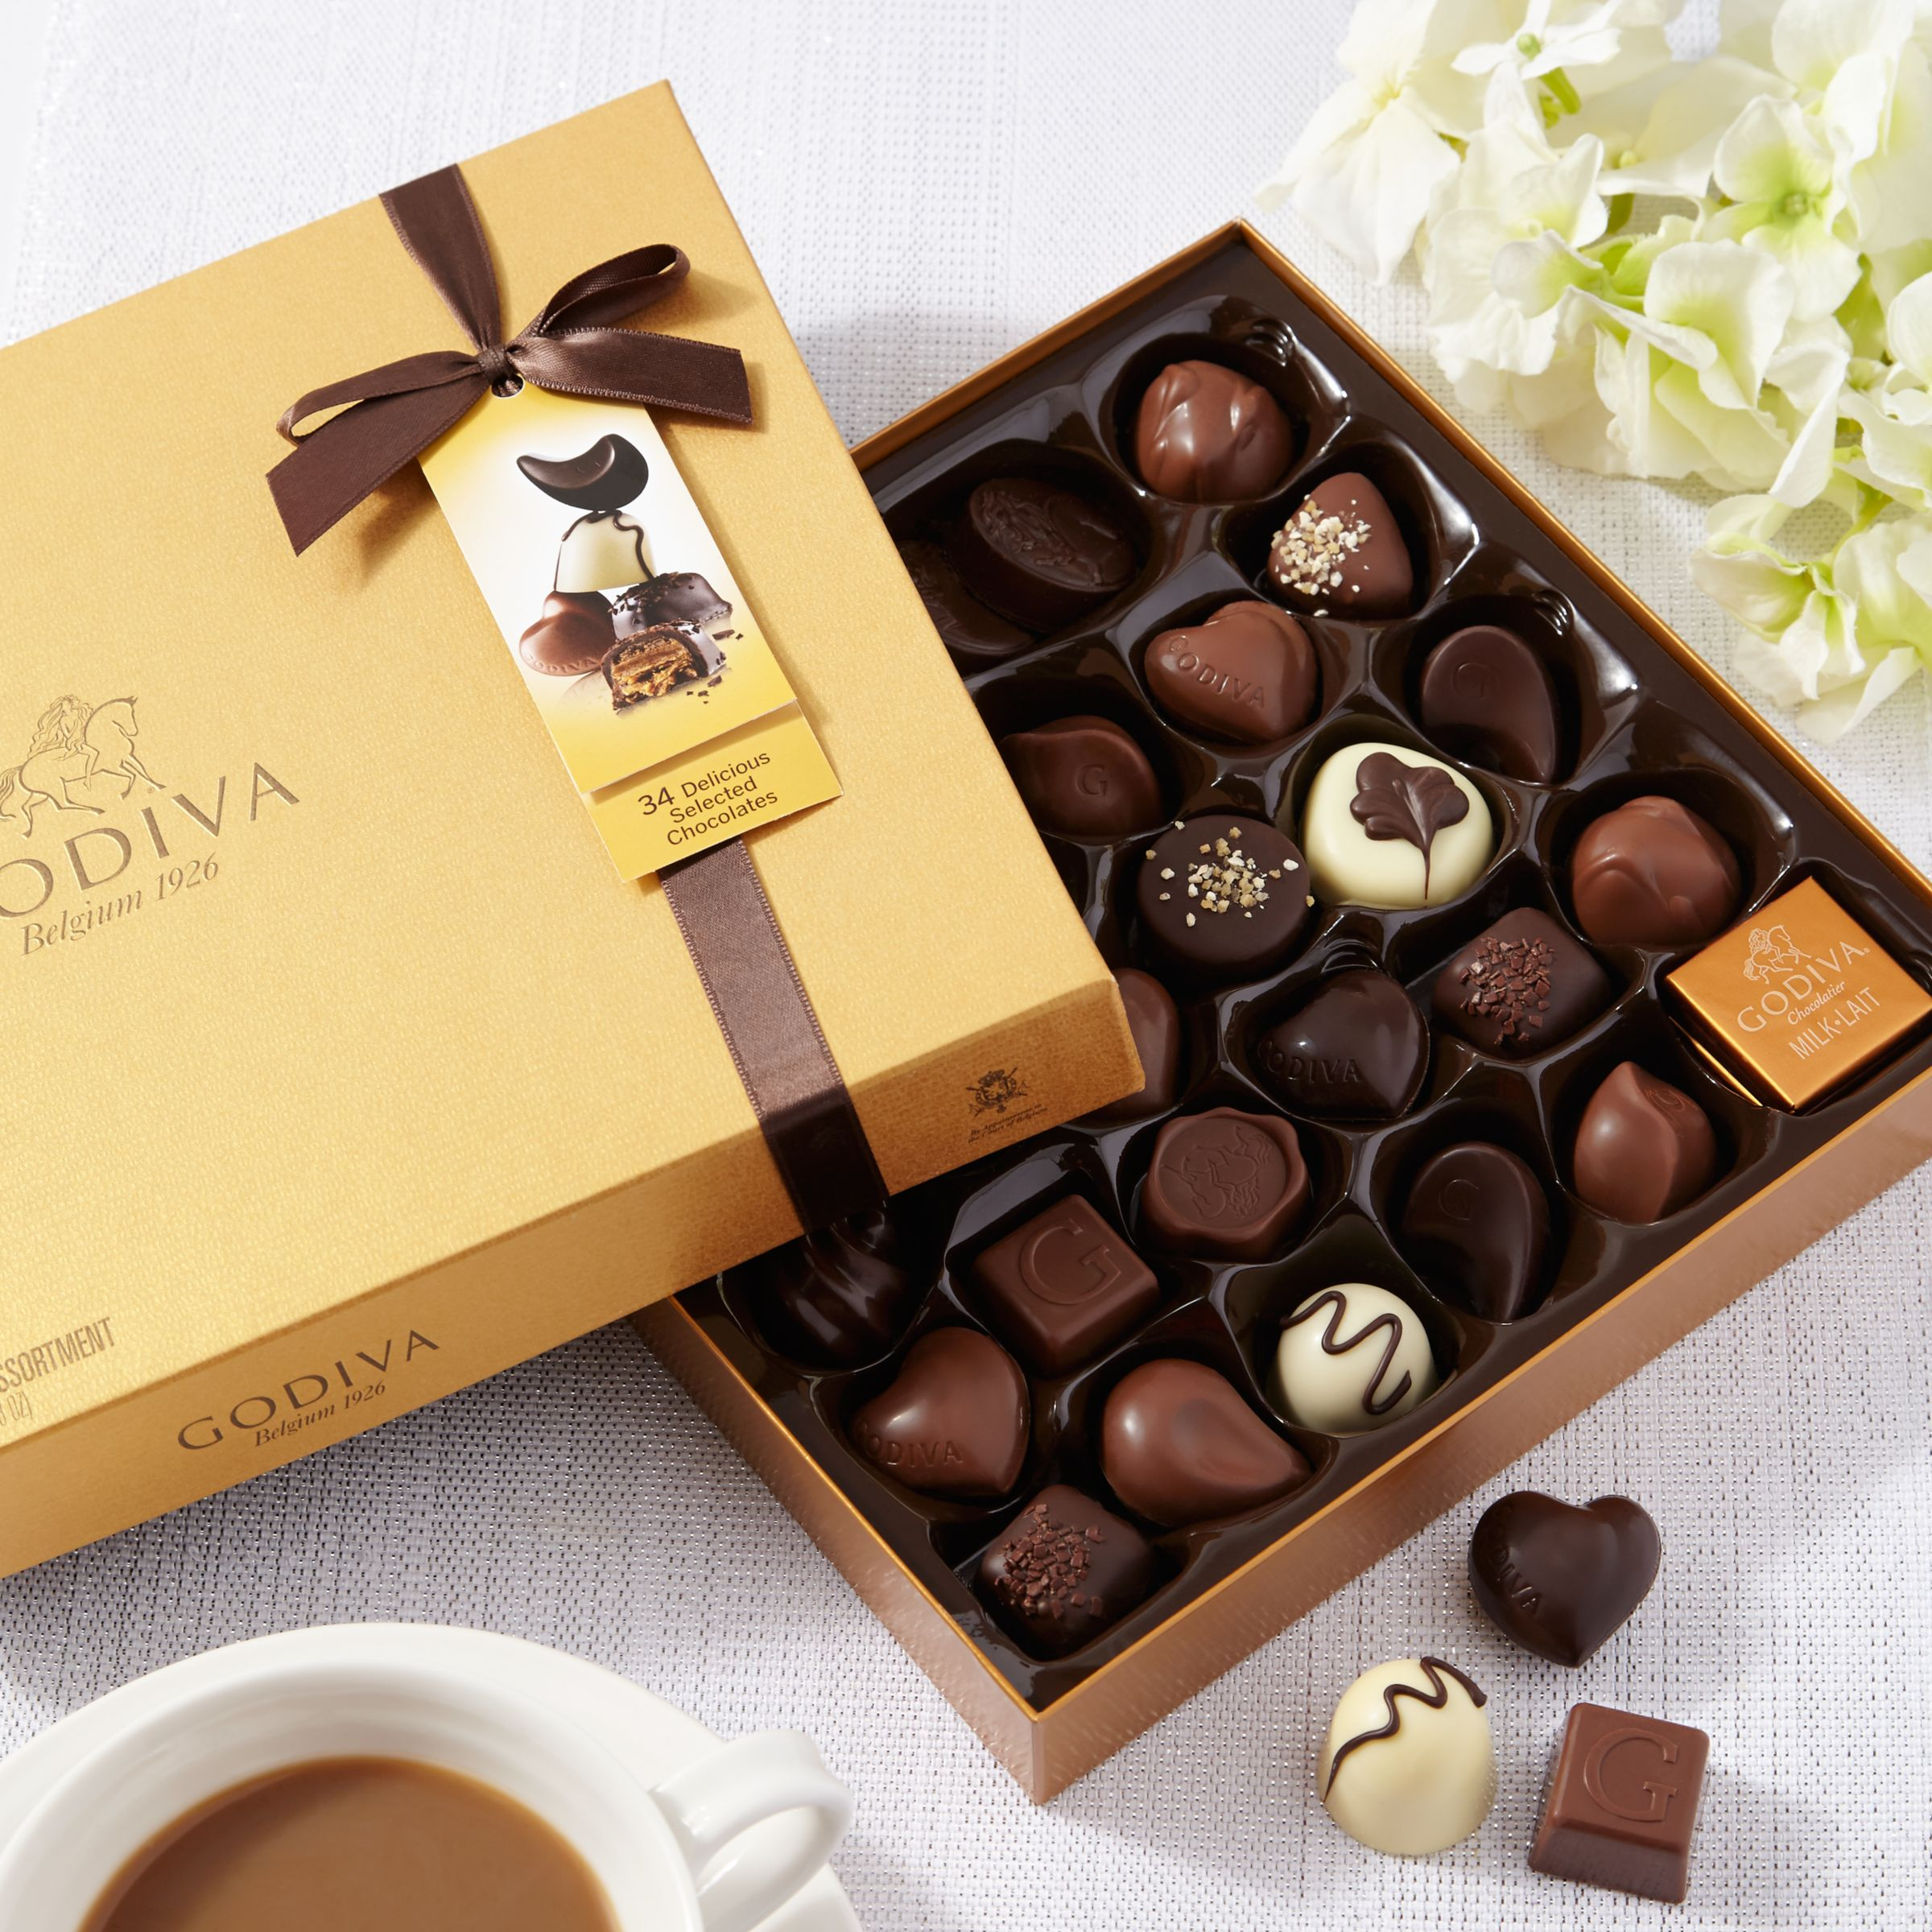 Godiva Godiva Gold Chocolate Box, 385g